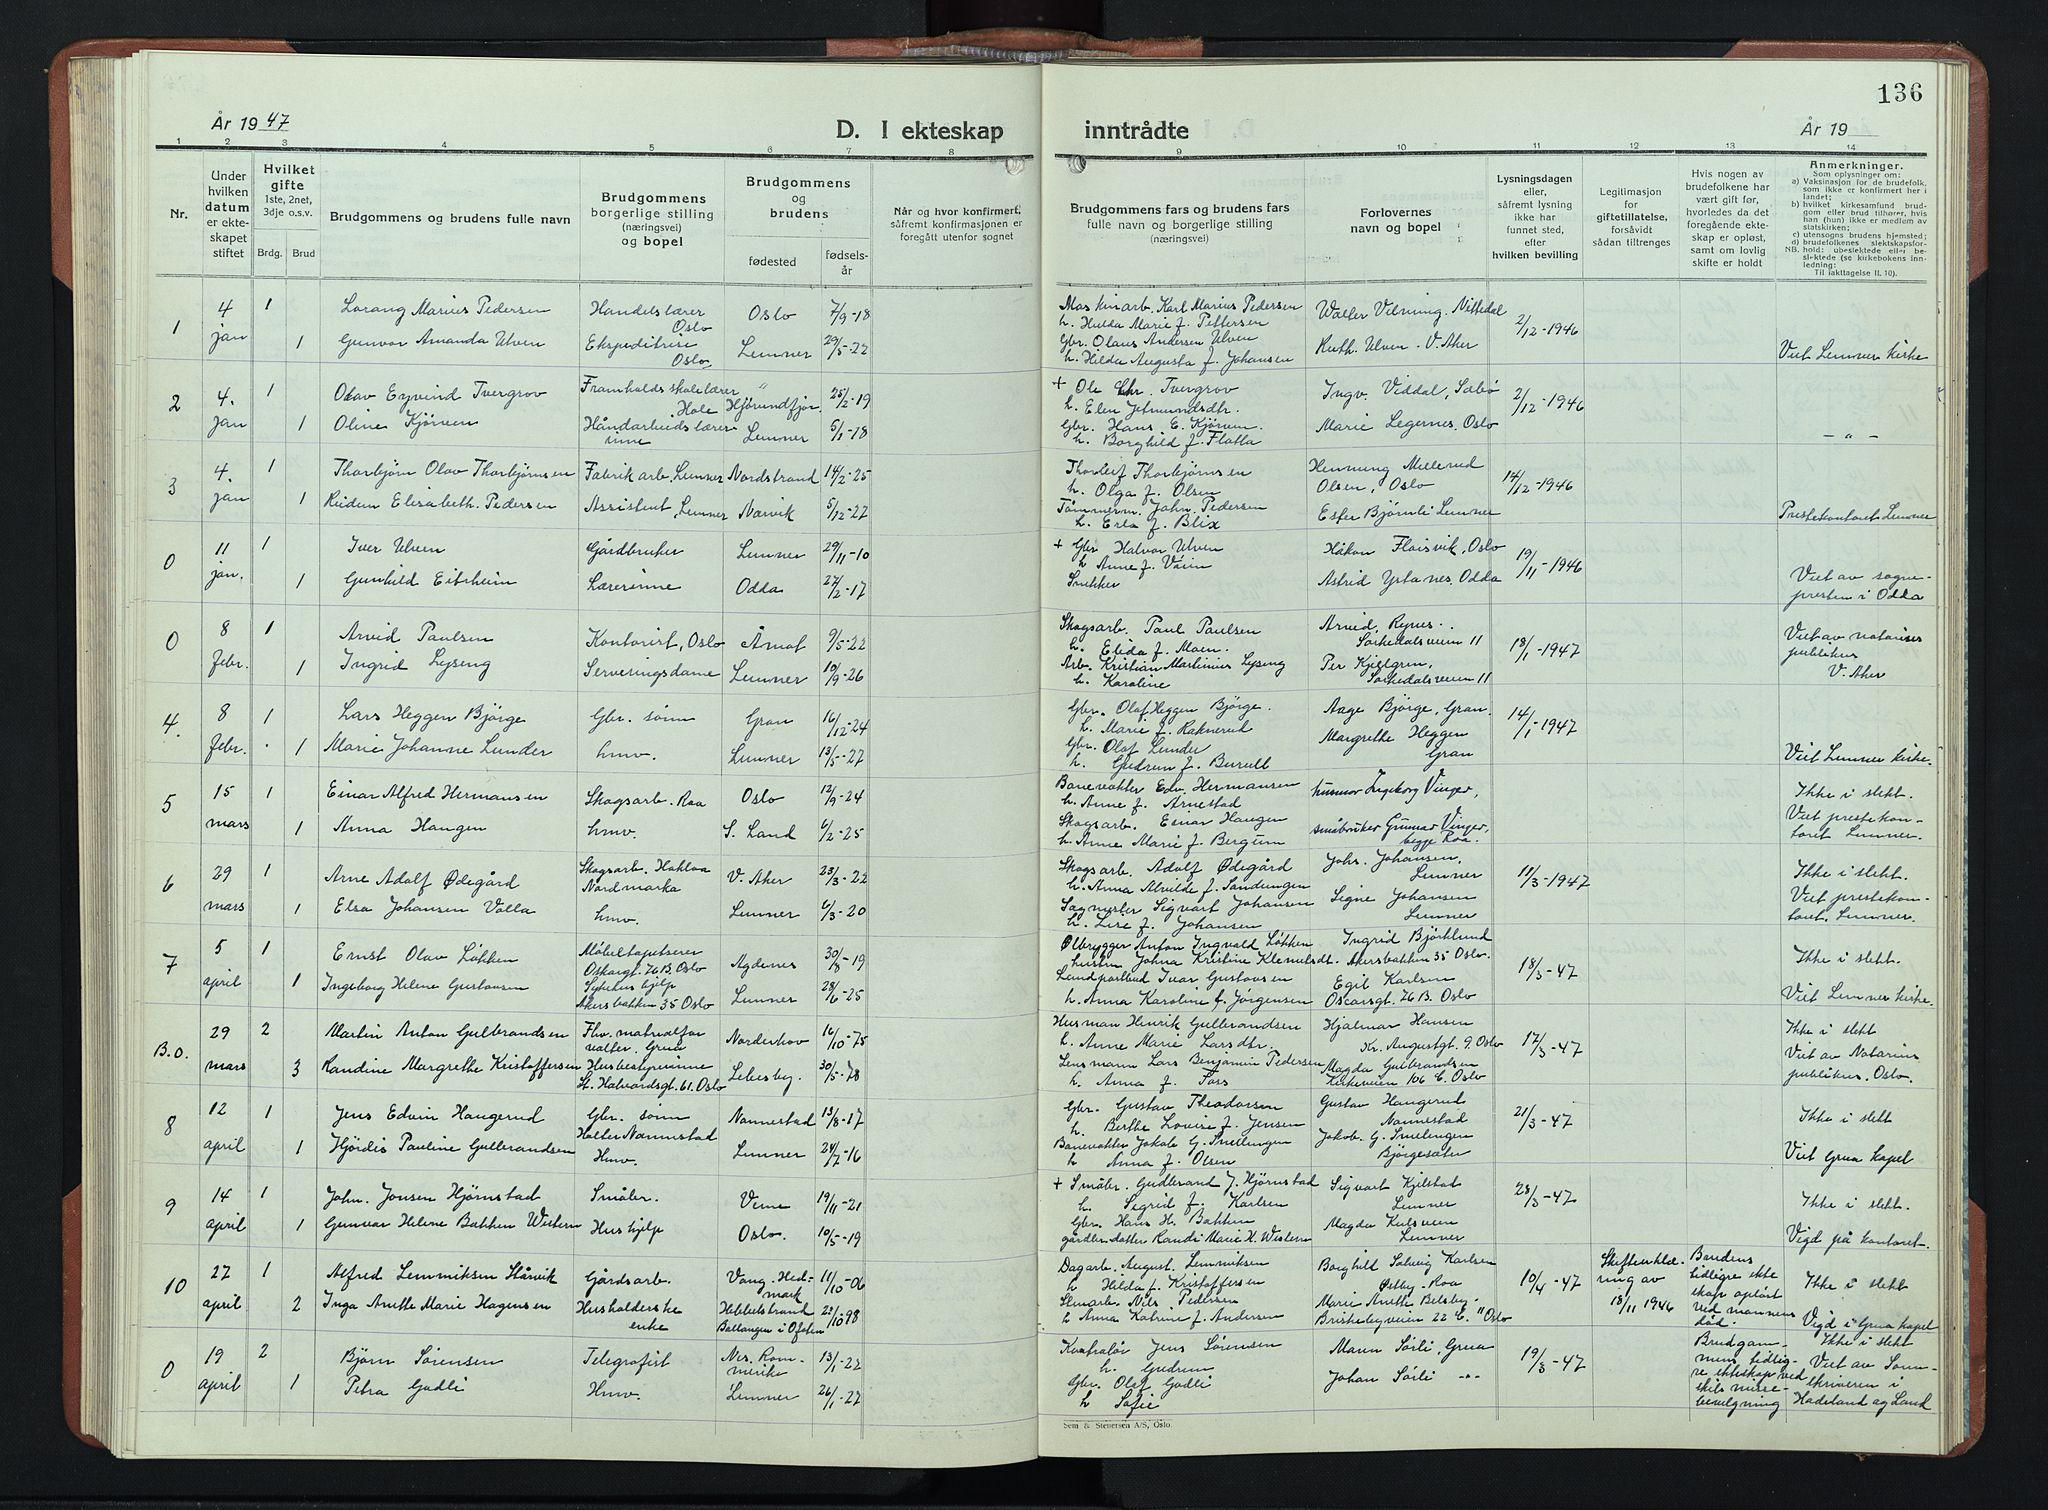 SAH, Lunner prestekontor, H/Ha/Hab/L0004: Klokkerbok nr. 4, 1943-1952, s. 136